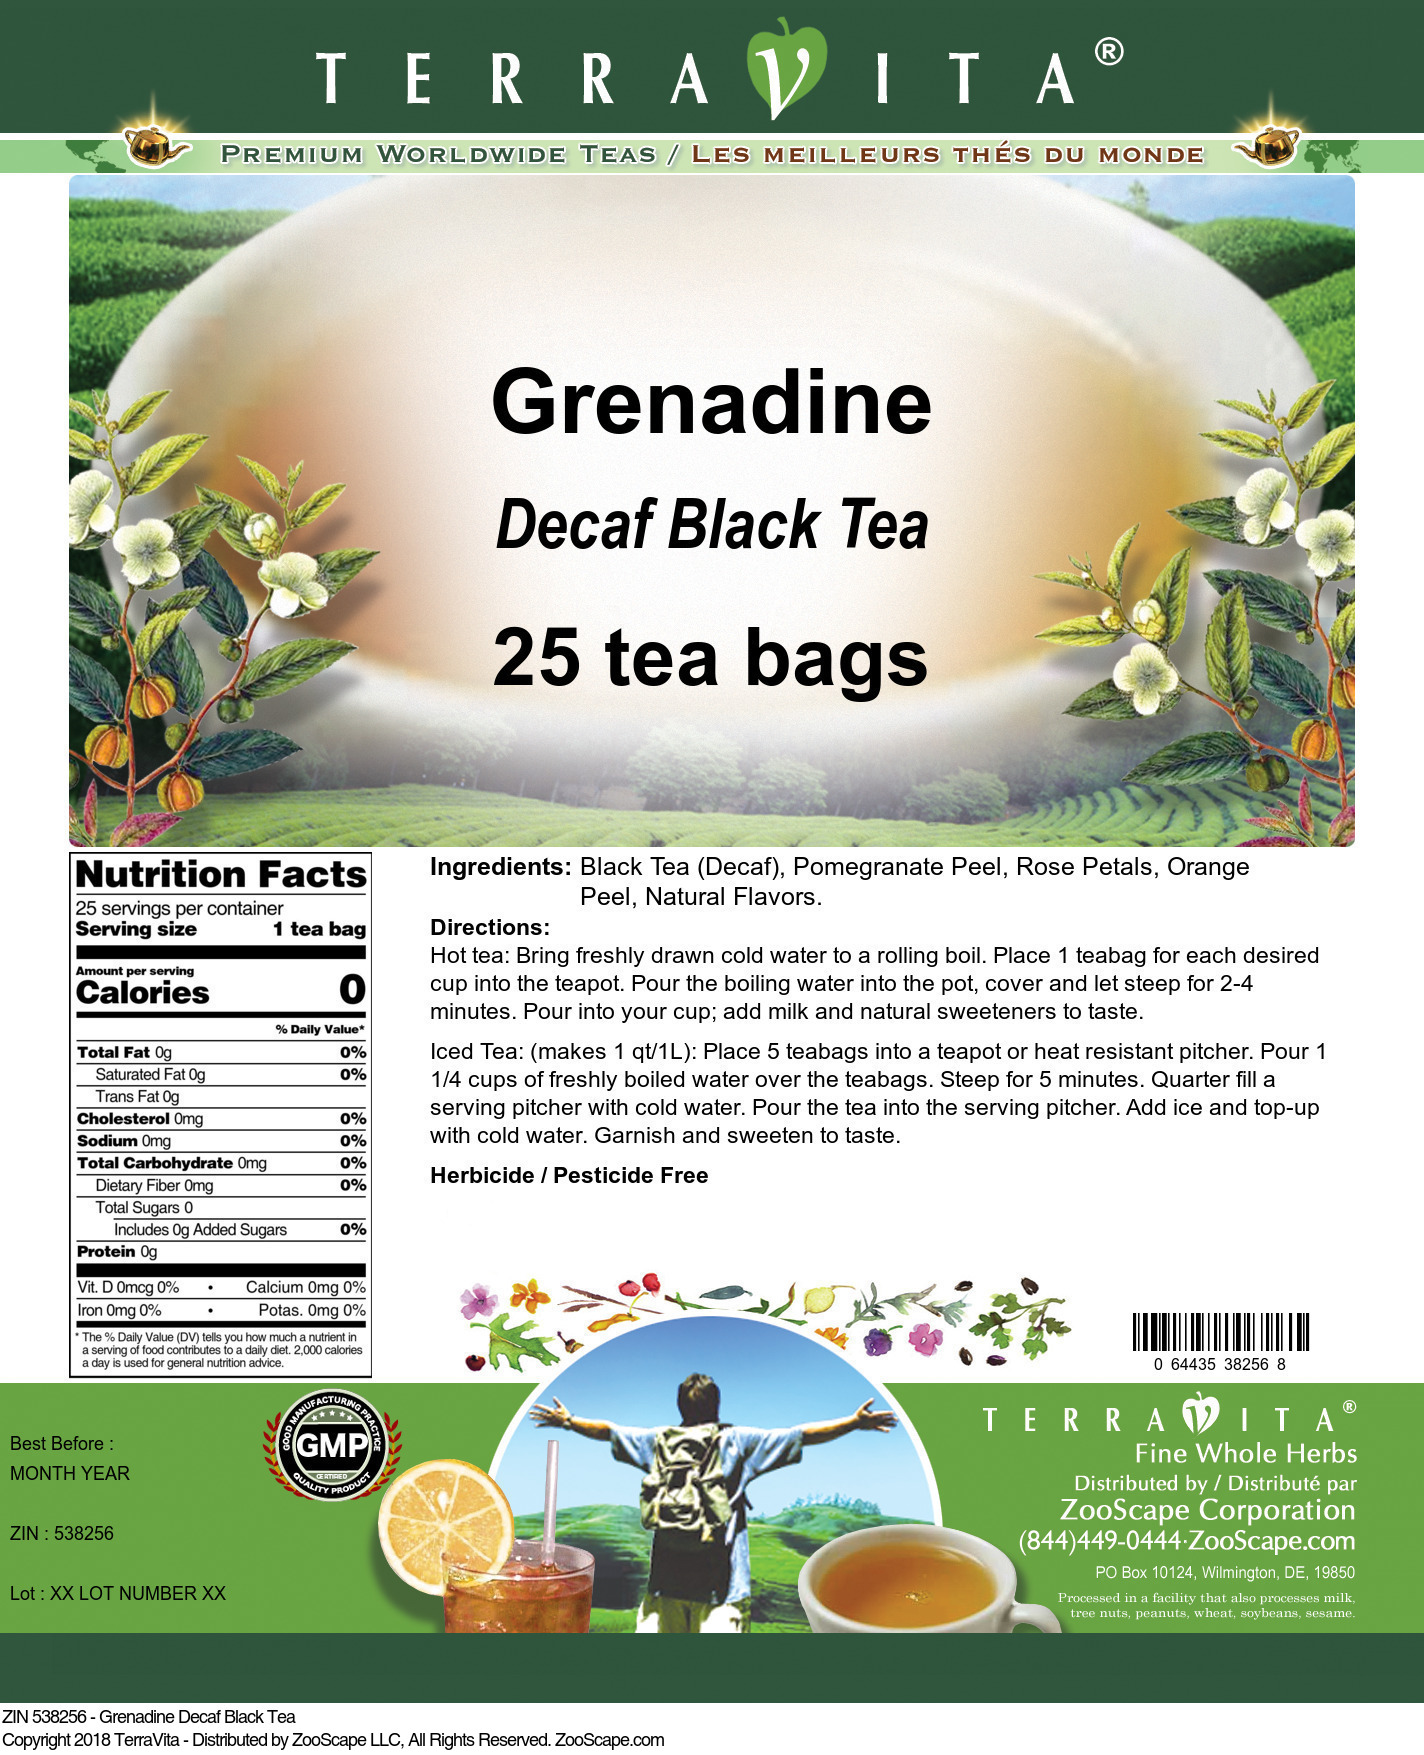 Grenadine Decaf Black Tea